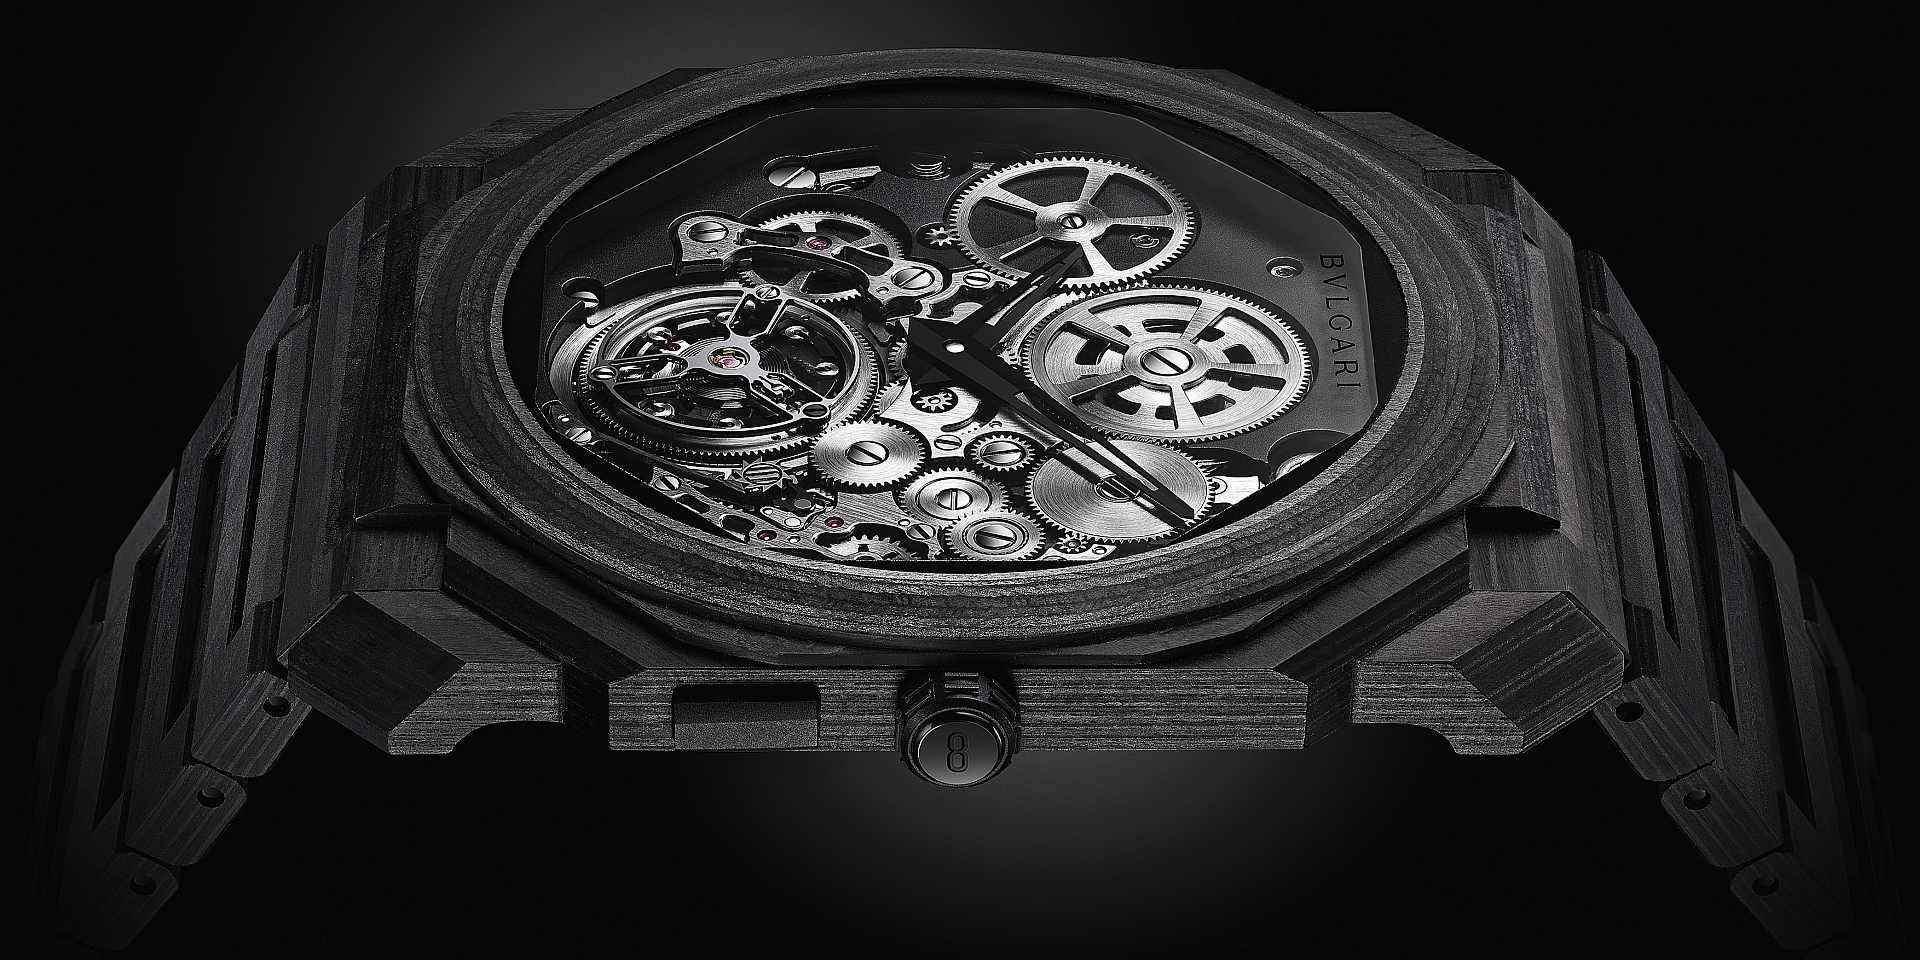 【2019 Pre-BASEL報導】BVLGARI引領瑞士製錶工藝與義大利文藝復興,進一步重新構思珠寶腕錶和高級複雜功能腕錶